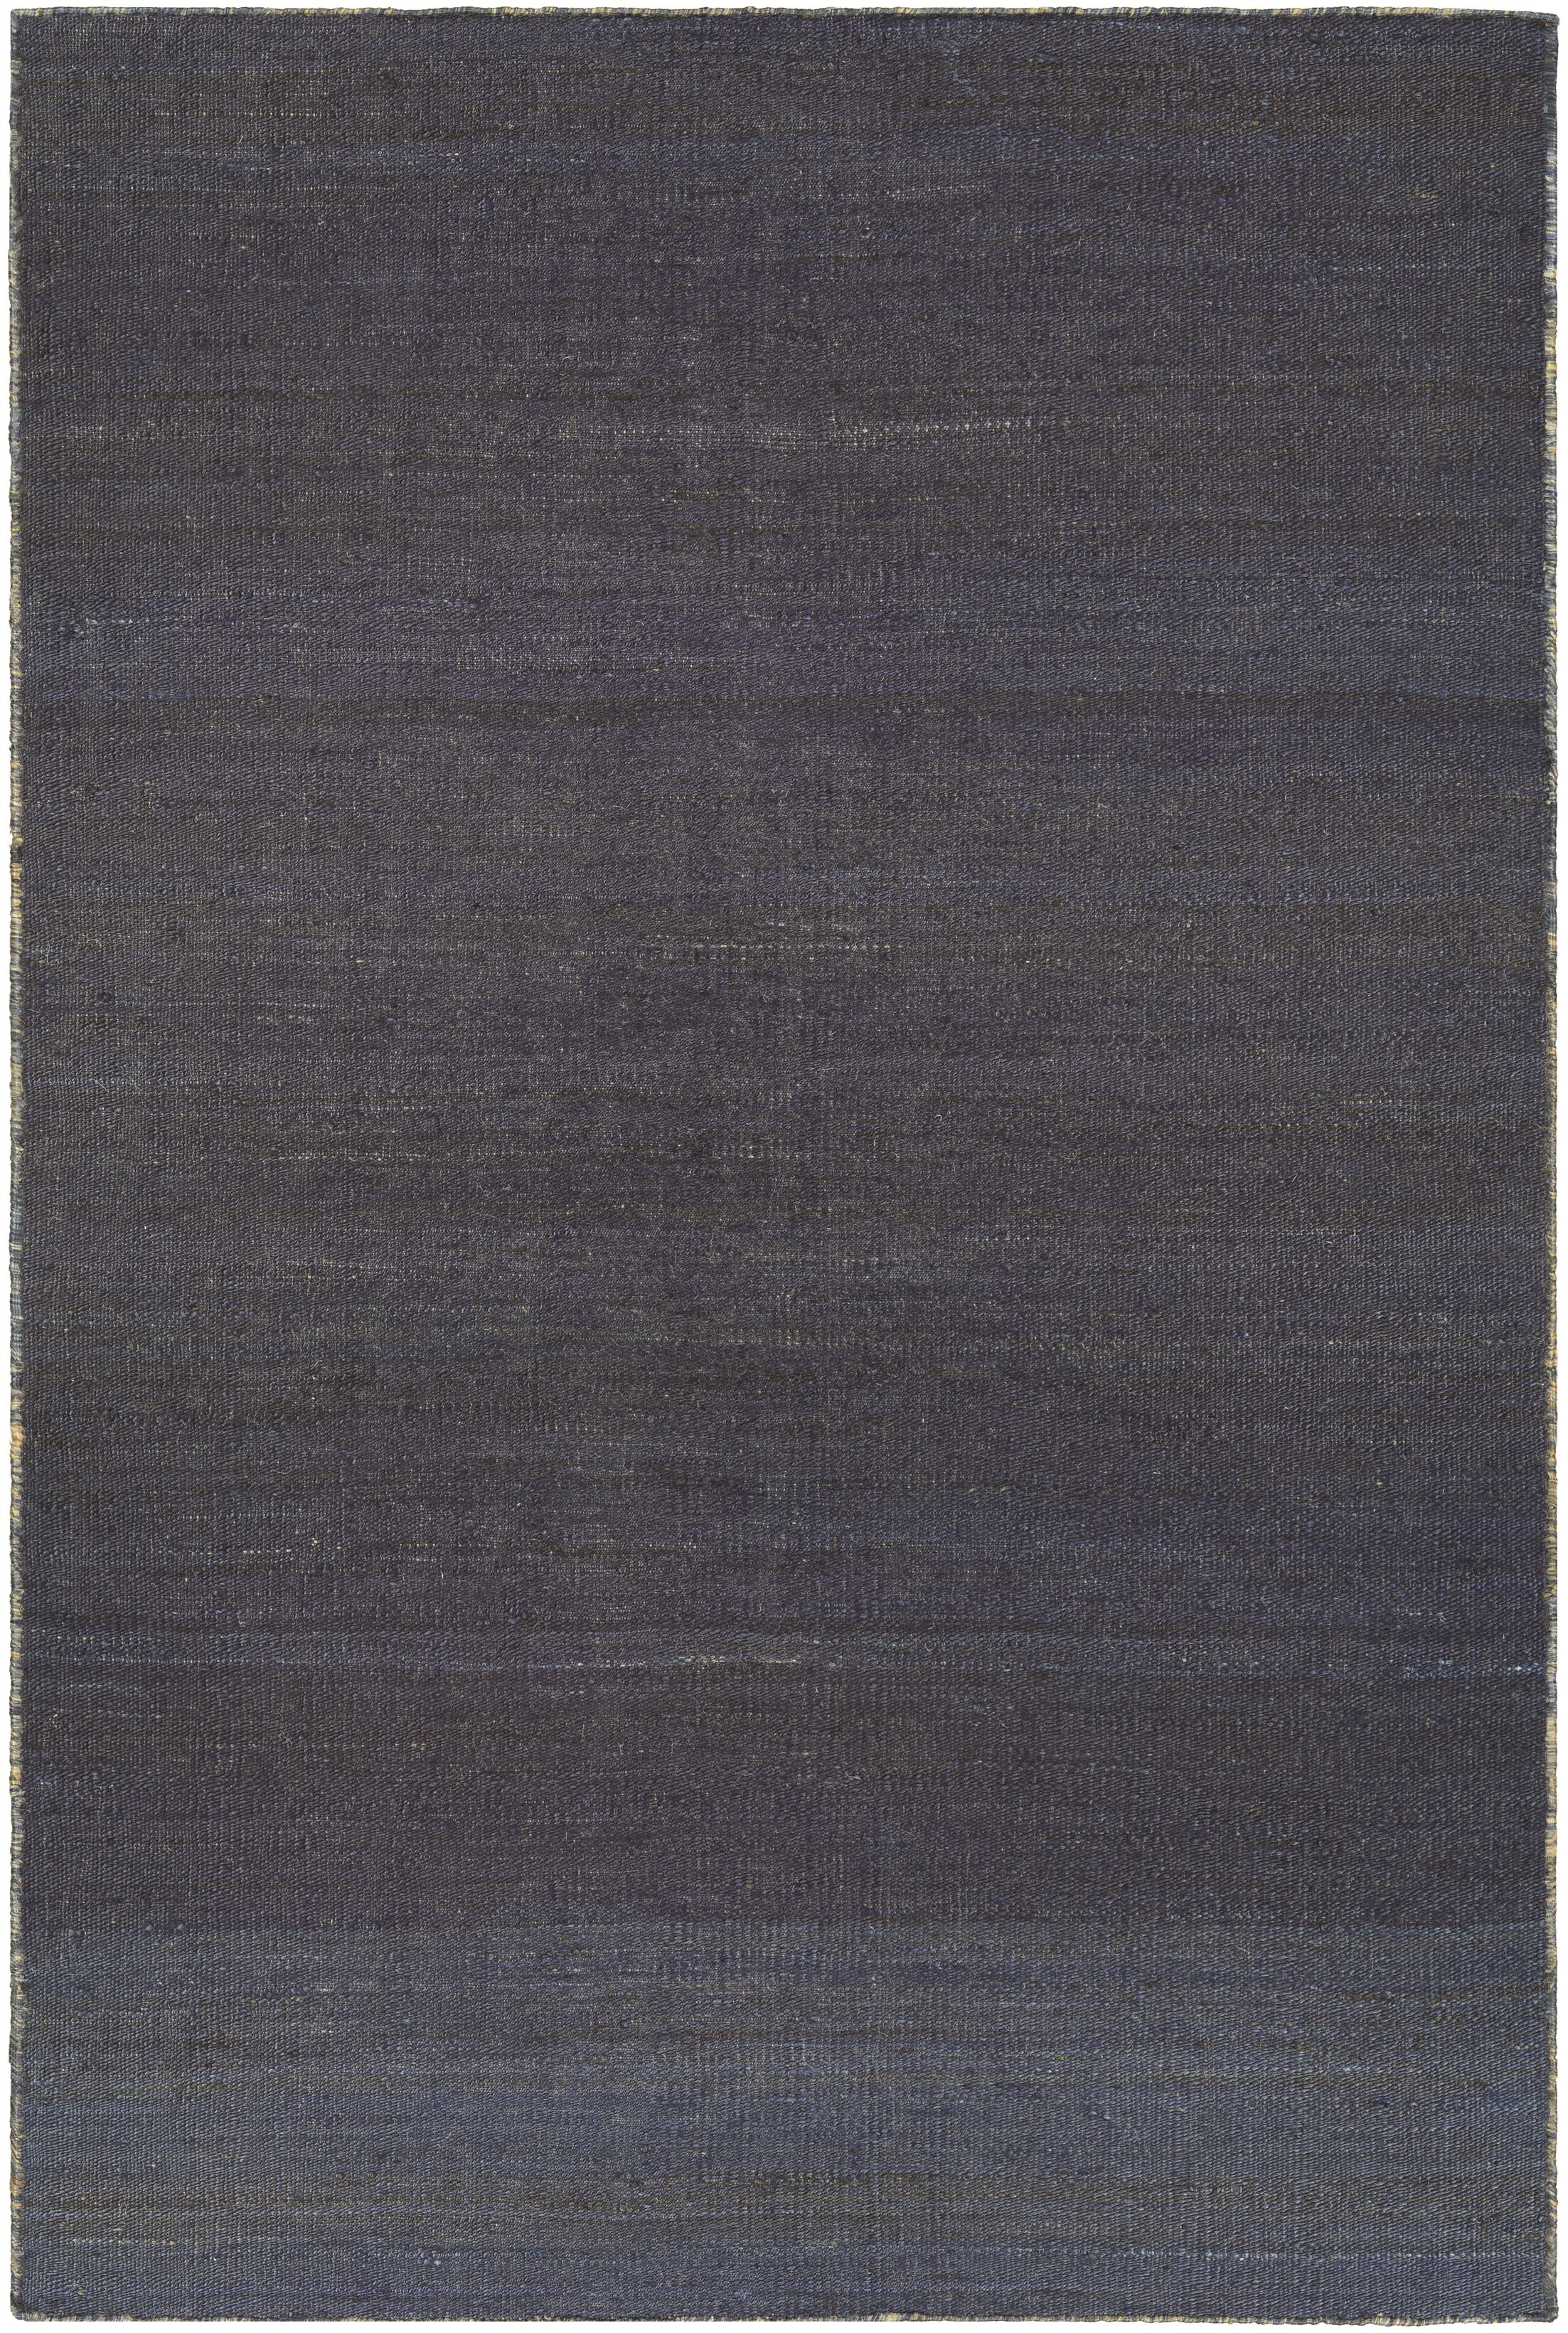 Uhlig Hand Woven Cotton Gray Area Rug Rug Size: Rectangle 5'3